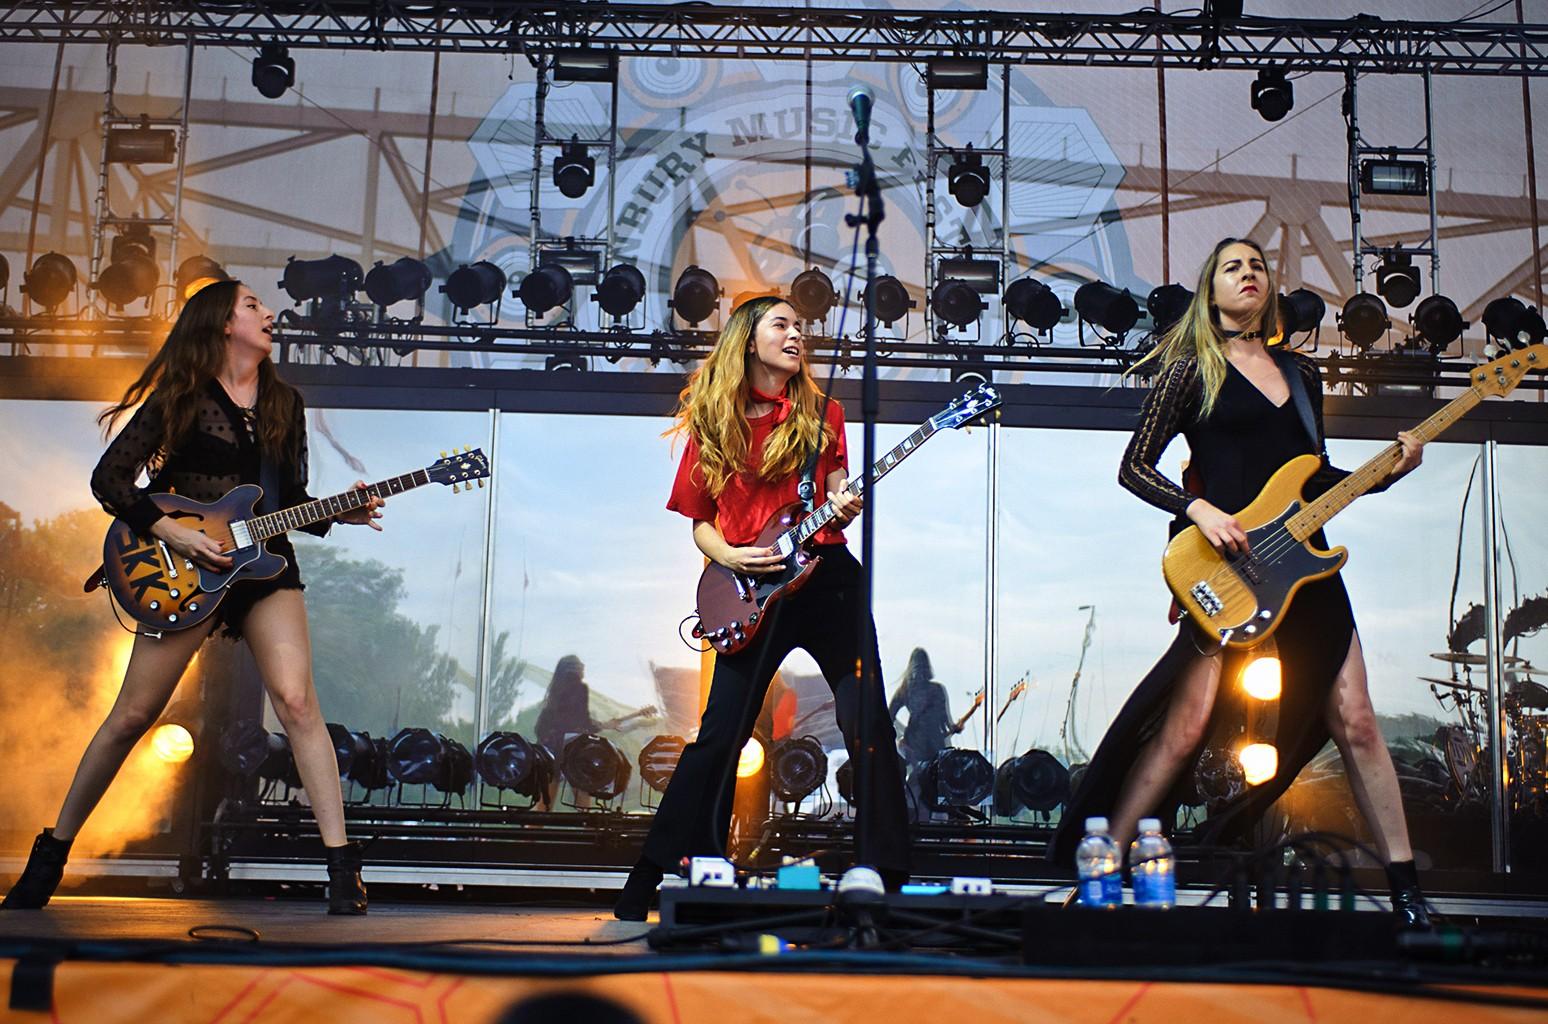 Danielle, Alana and Este Haim of Haim performs performs at the Bunbury Festival on June 3, 2016 in Cincinnati, Ohio.